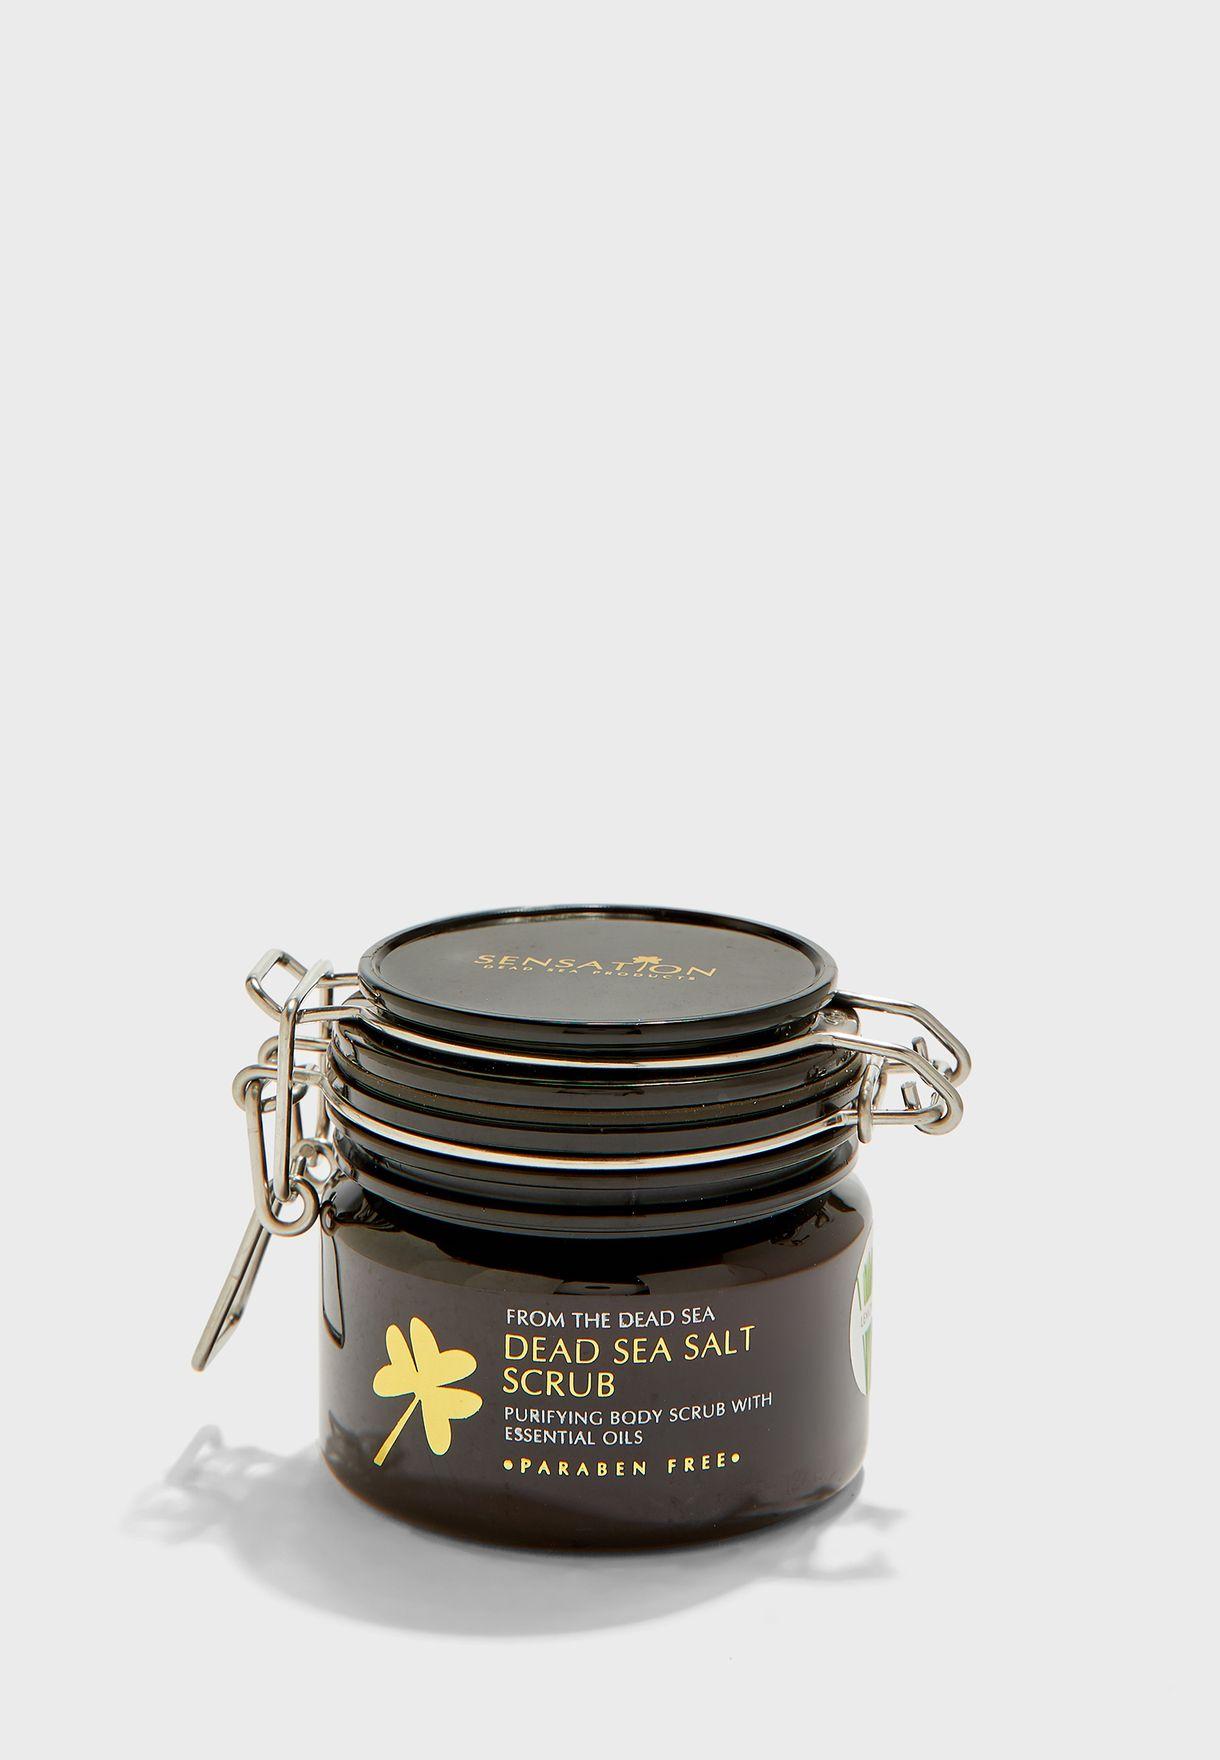 Dead Sea Salt Scrub - Lemon Grass 200g